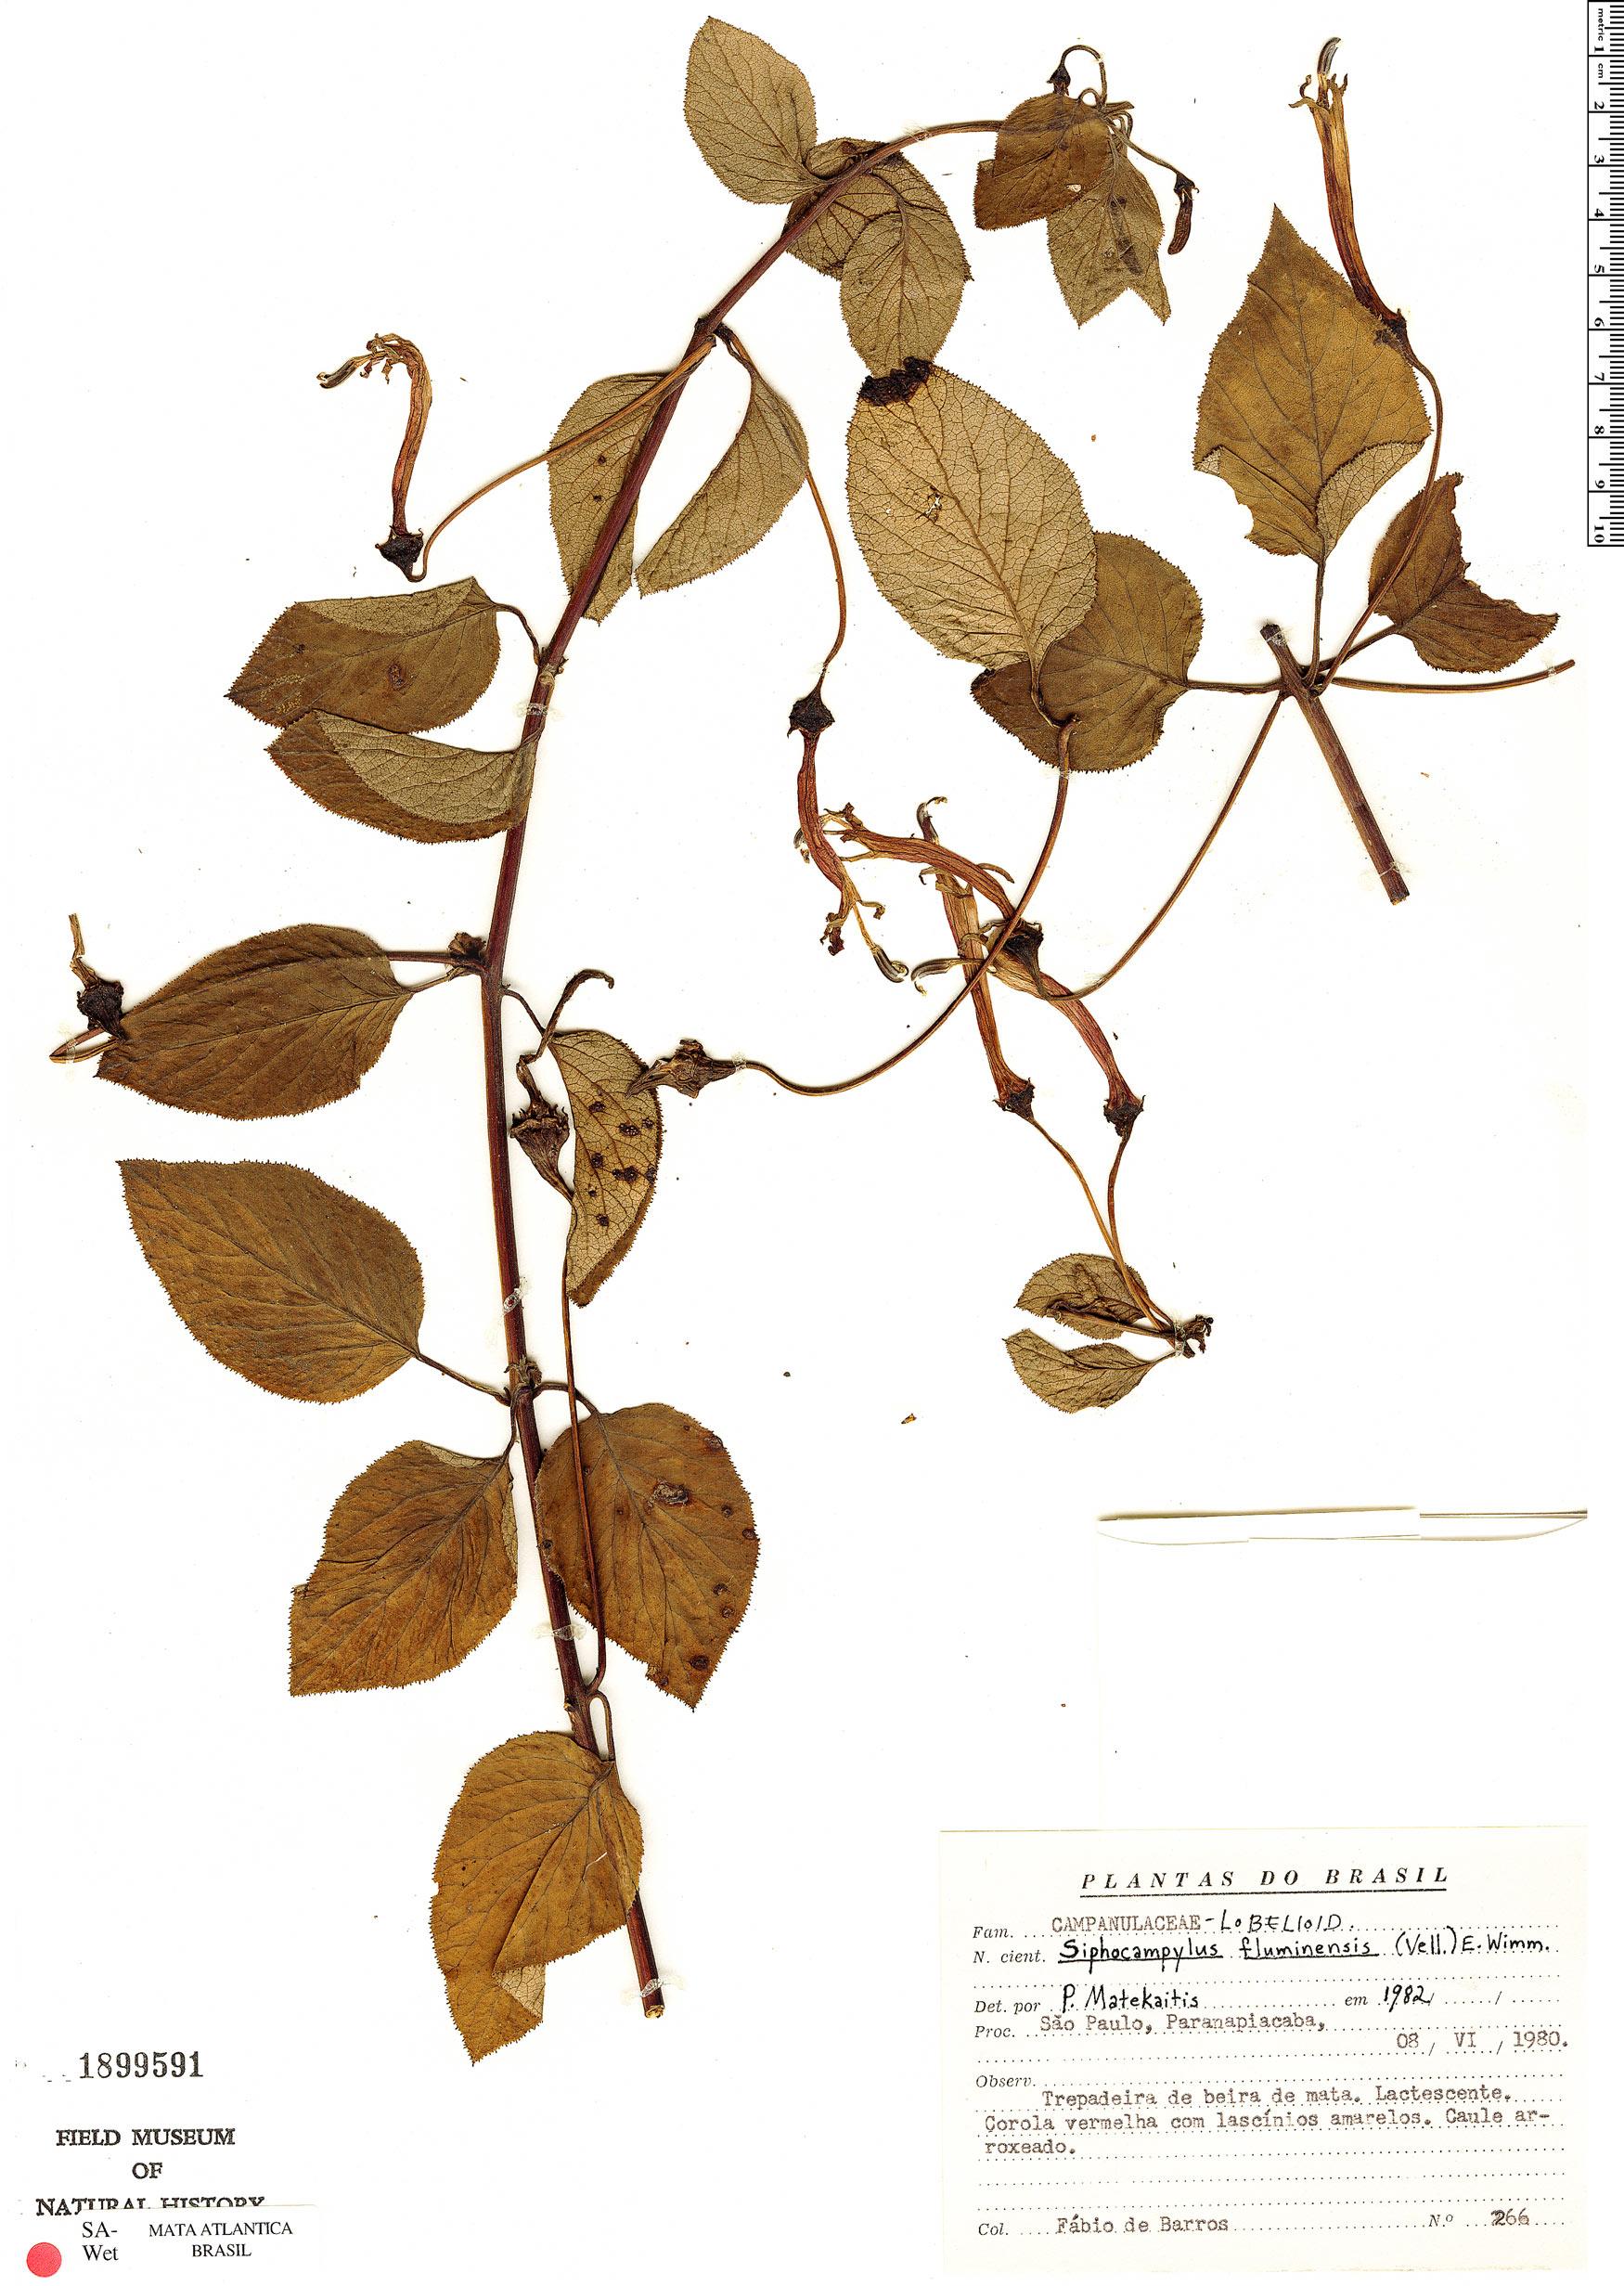 Specimen: Siphocampylus fluminensis